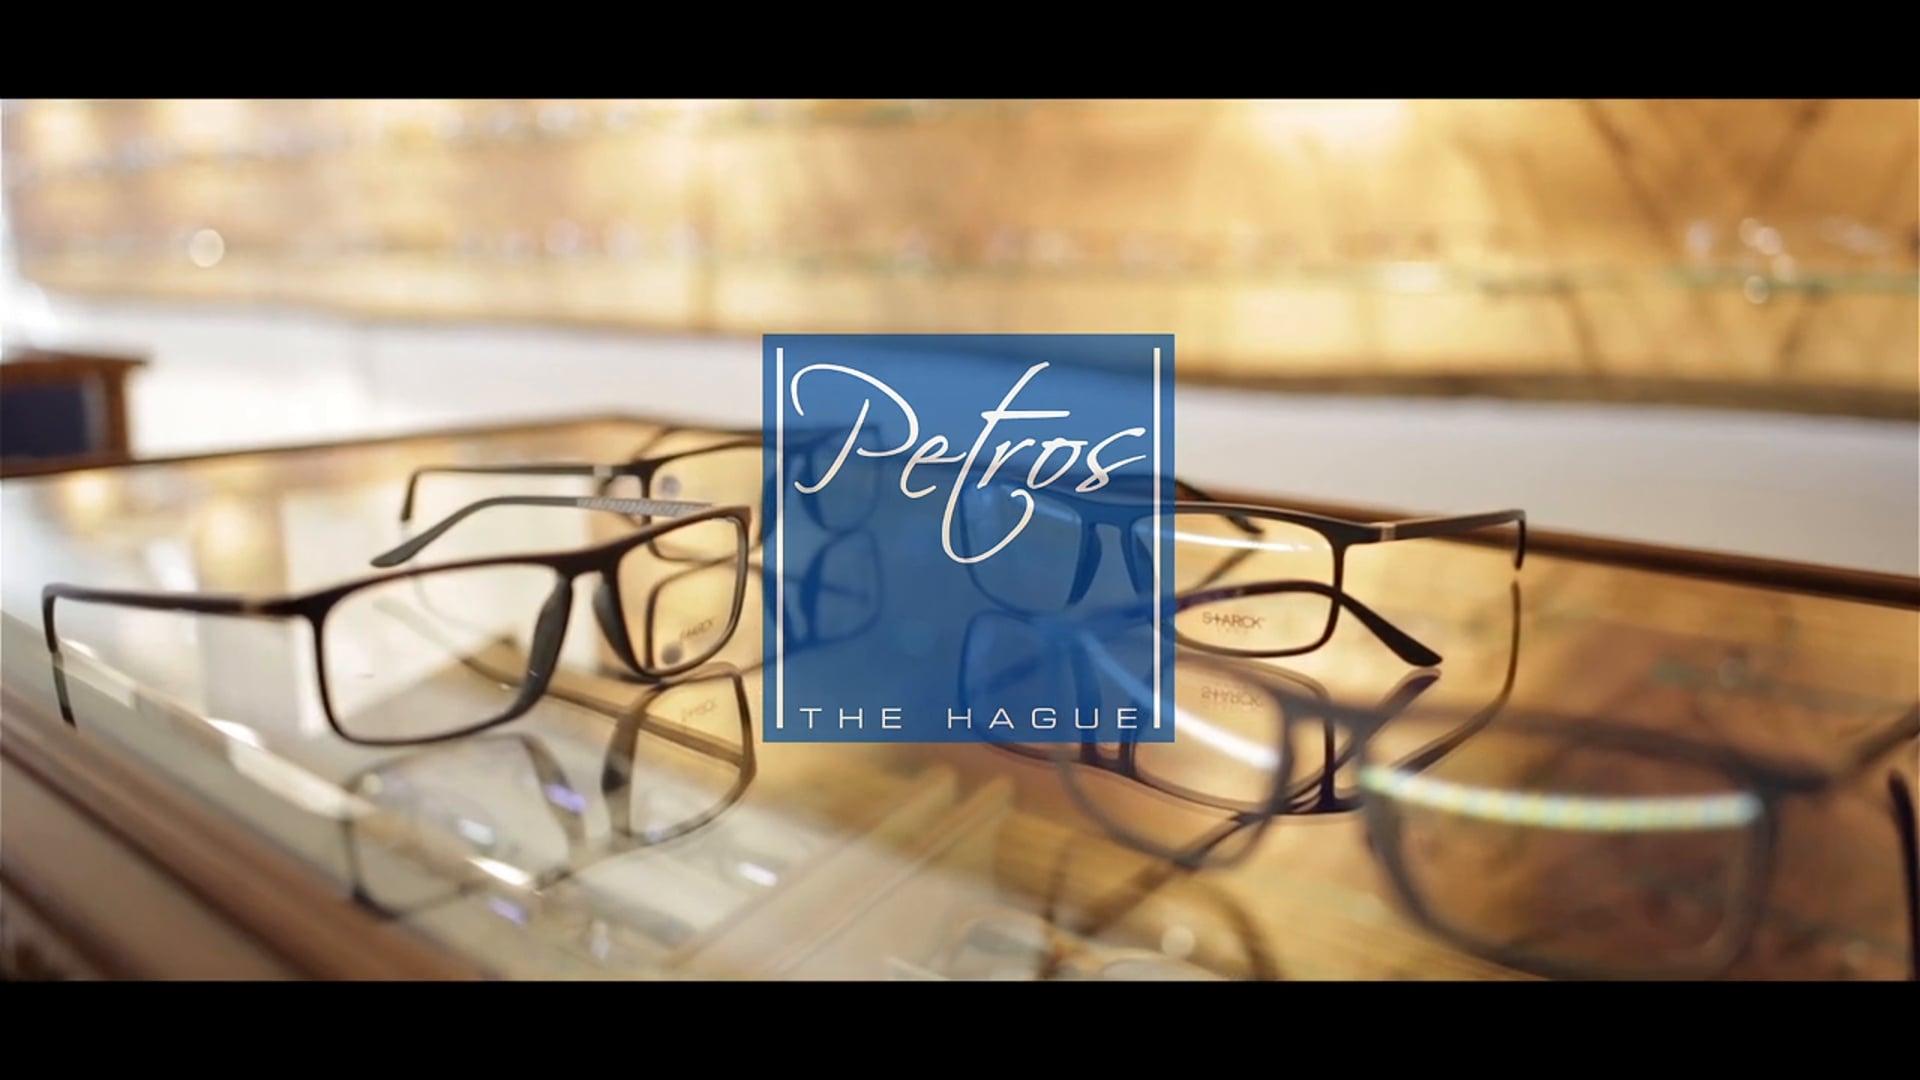 Petros The Hague Branding Video